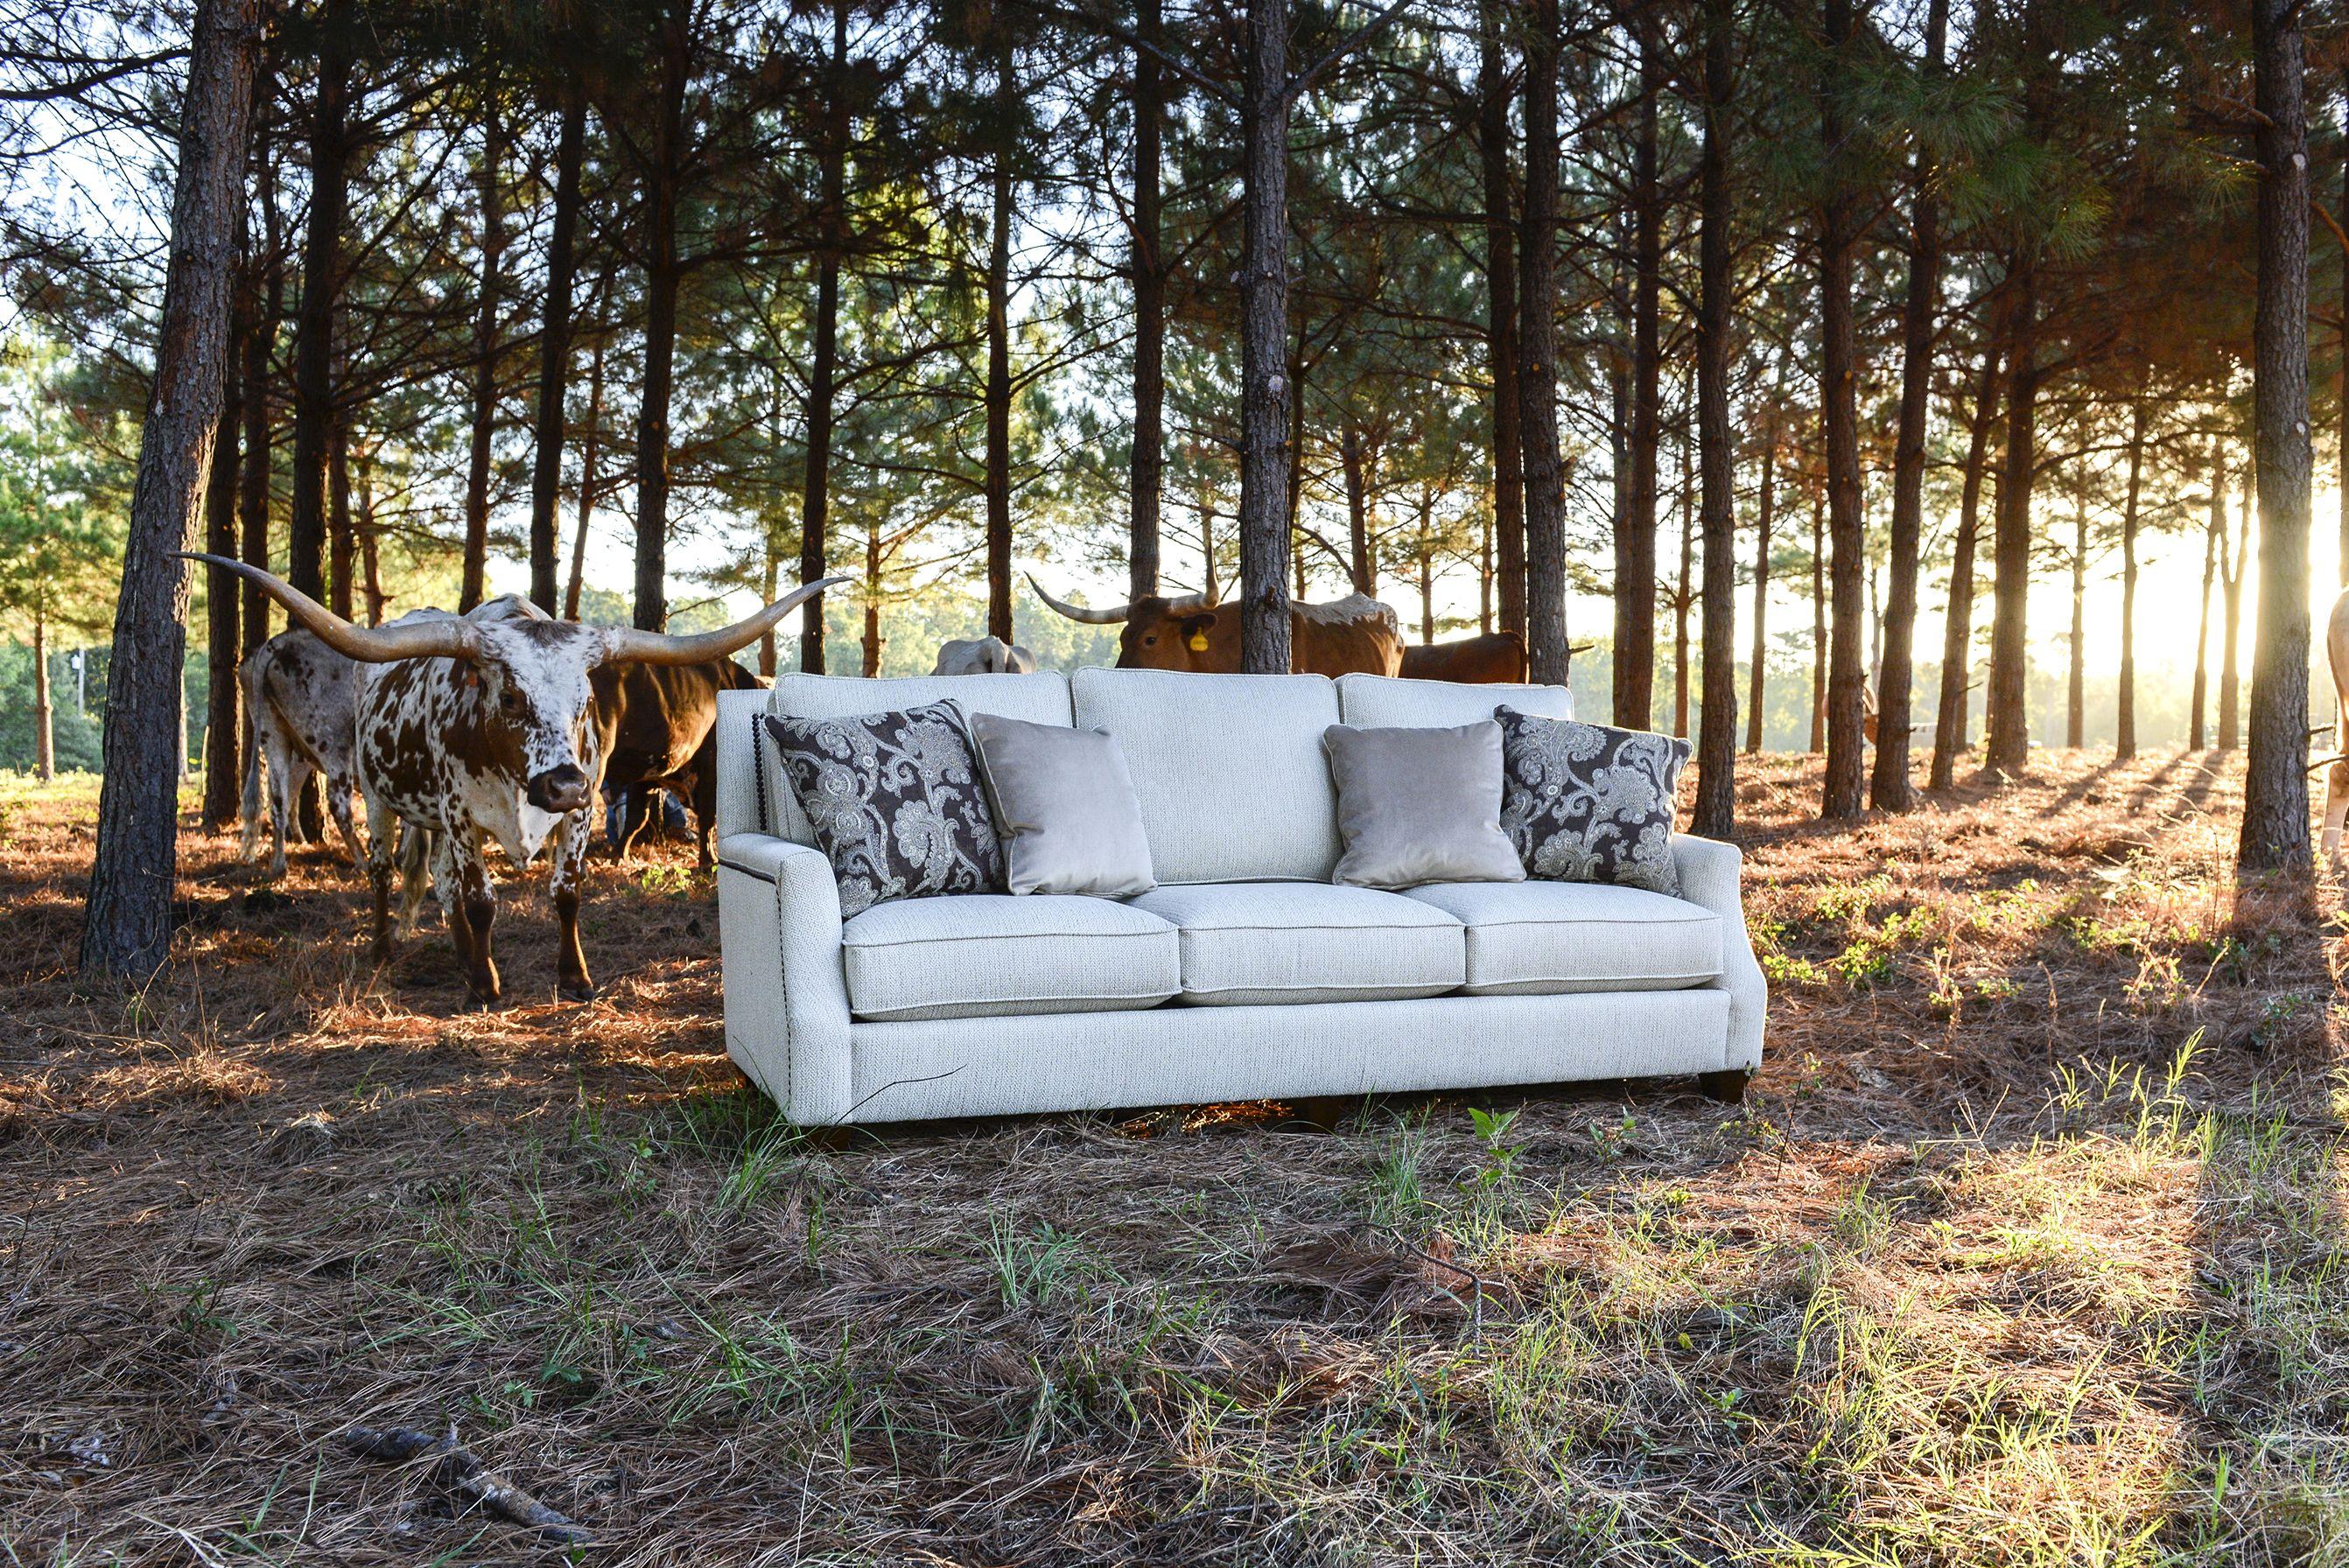 Mayo Furniture 6200 Fabric Sofa Clarion Cream Outdoor Sofa